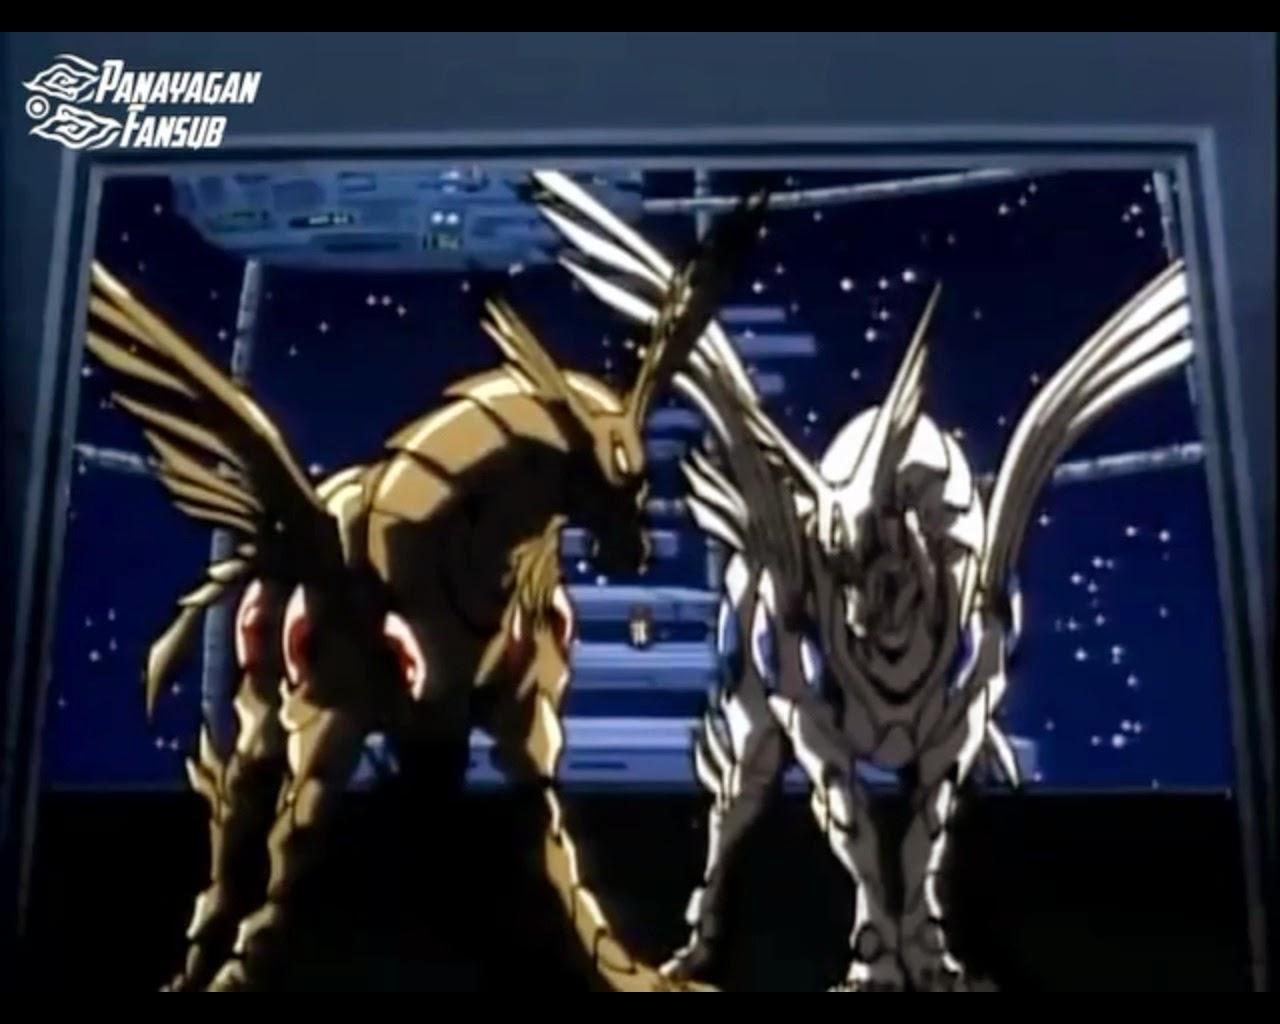 Download B't X Neo Episode 10 Subtitle Indonesia